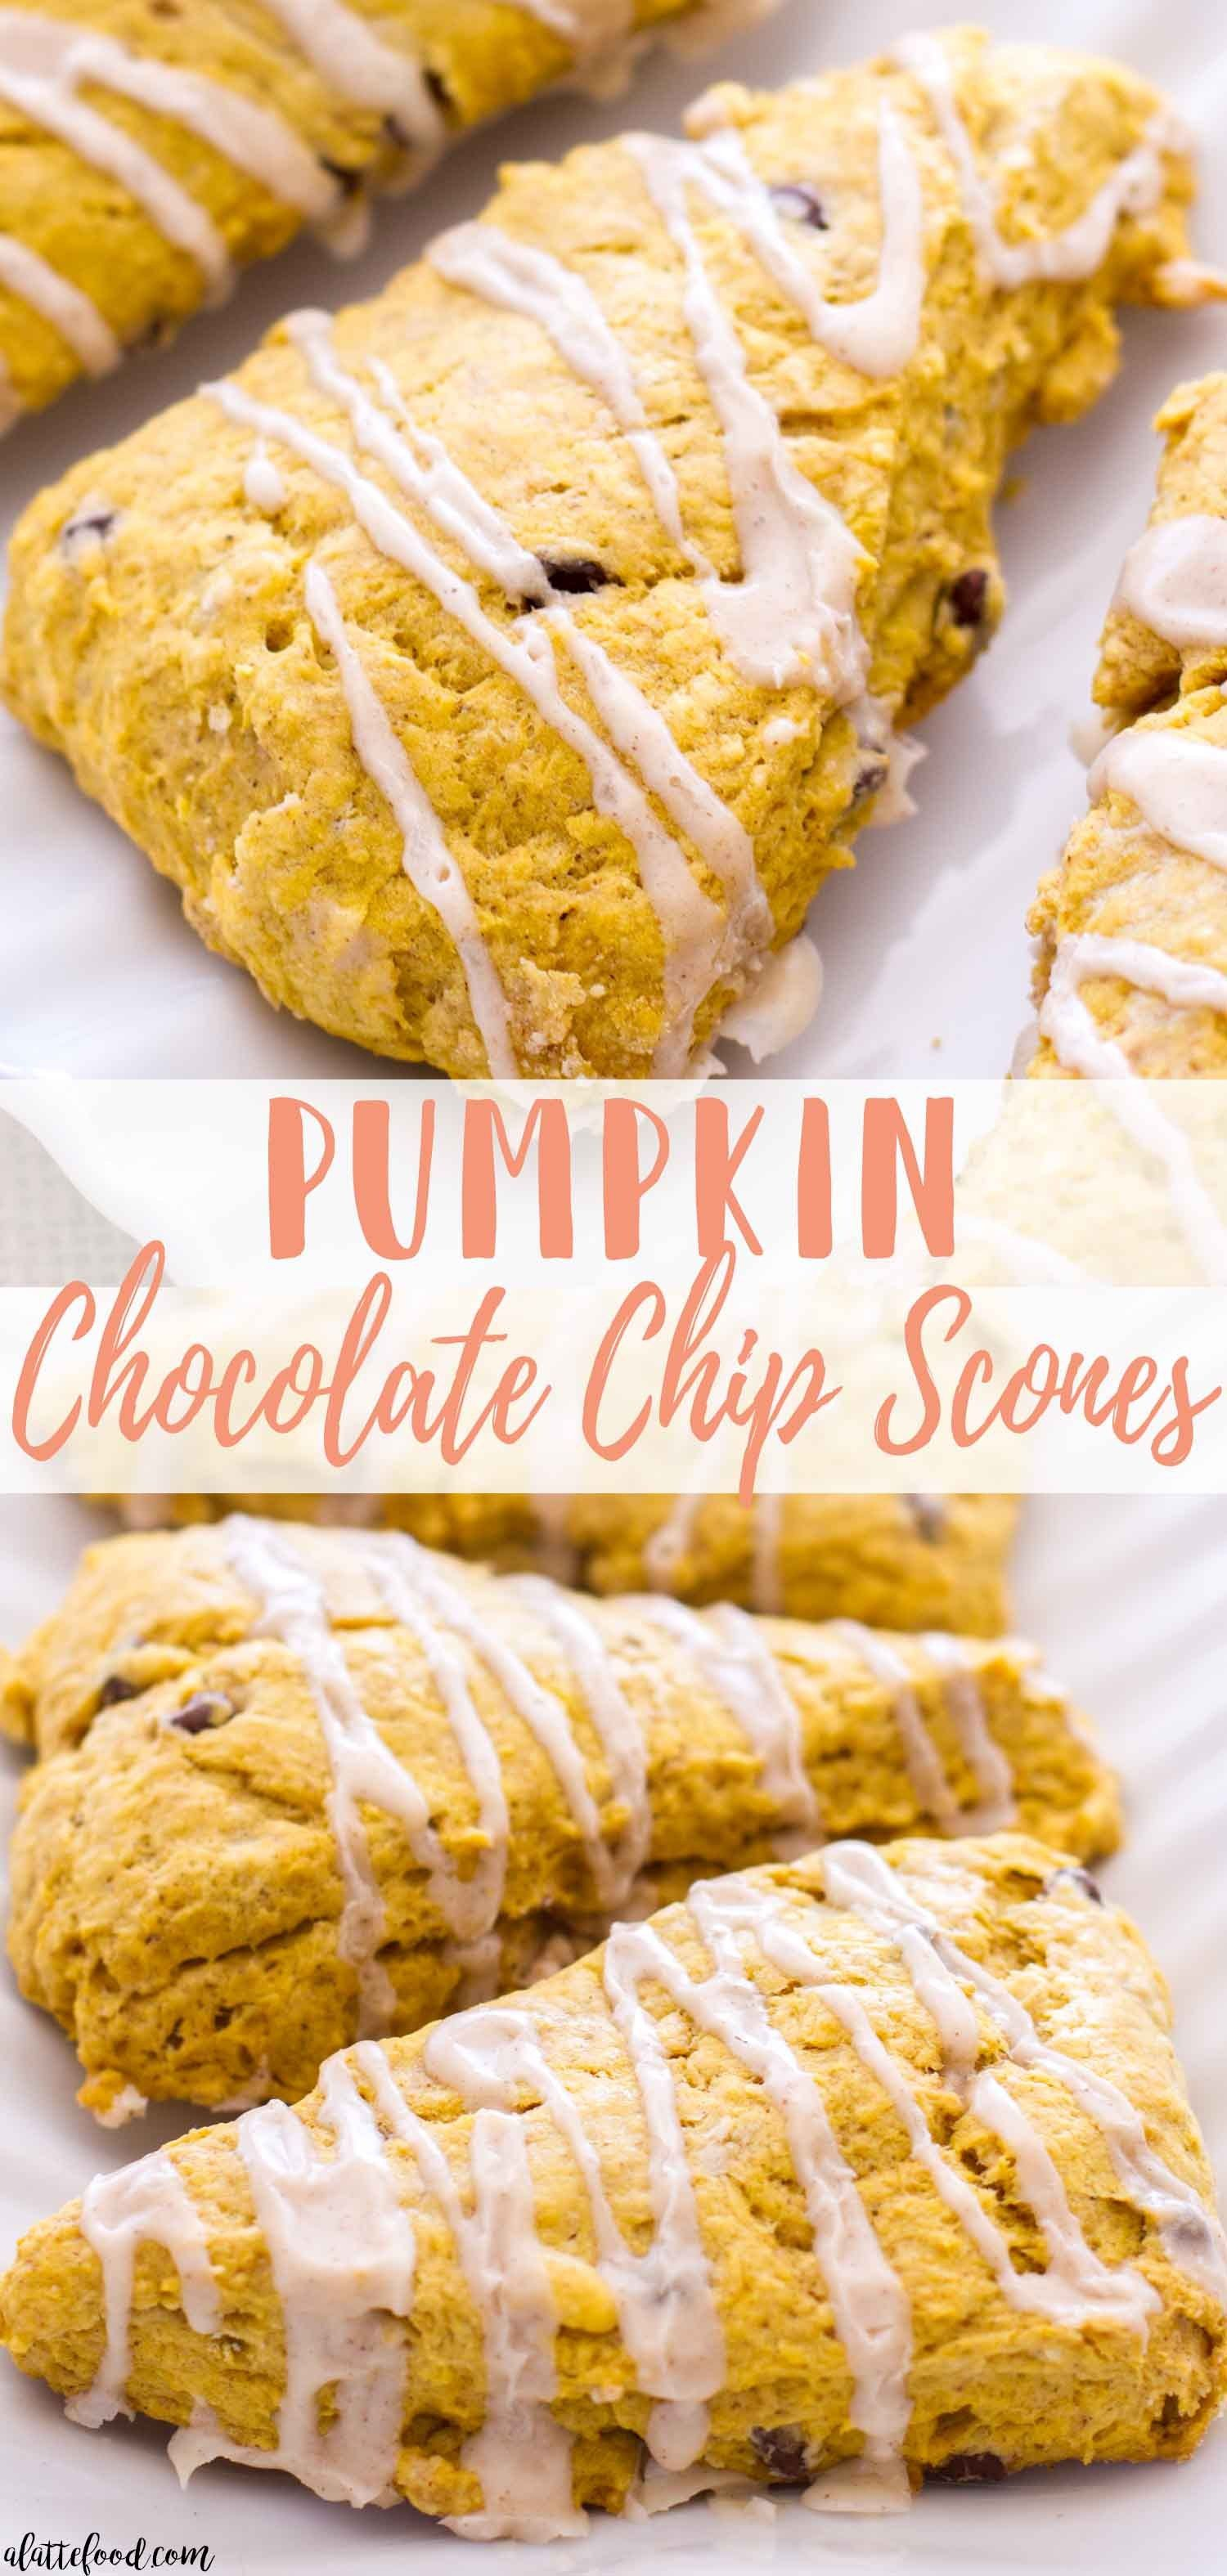 Pumpkin Chocolate Chip Scones